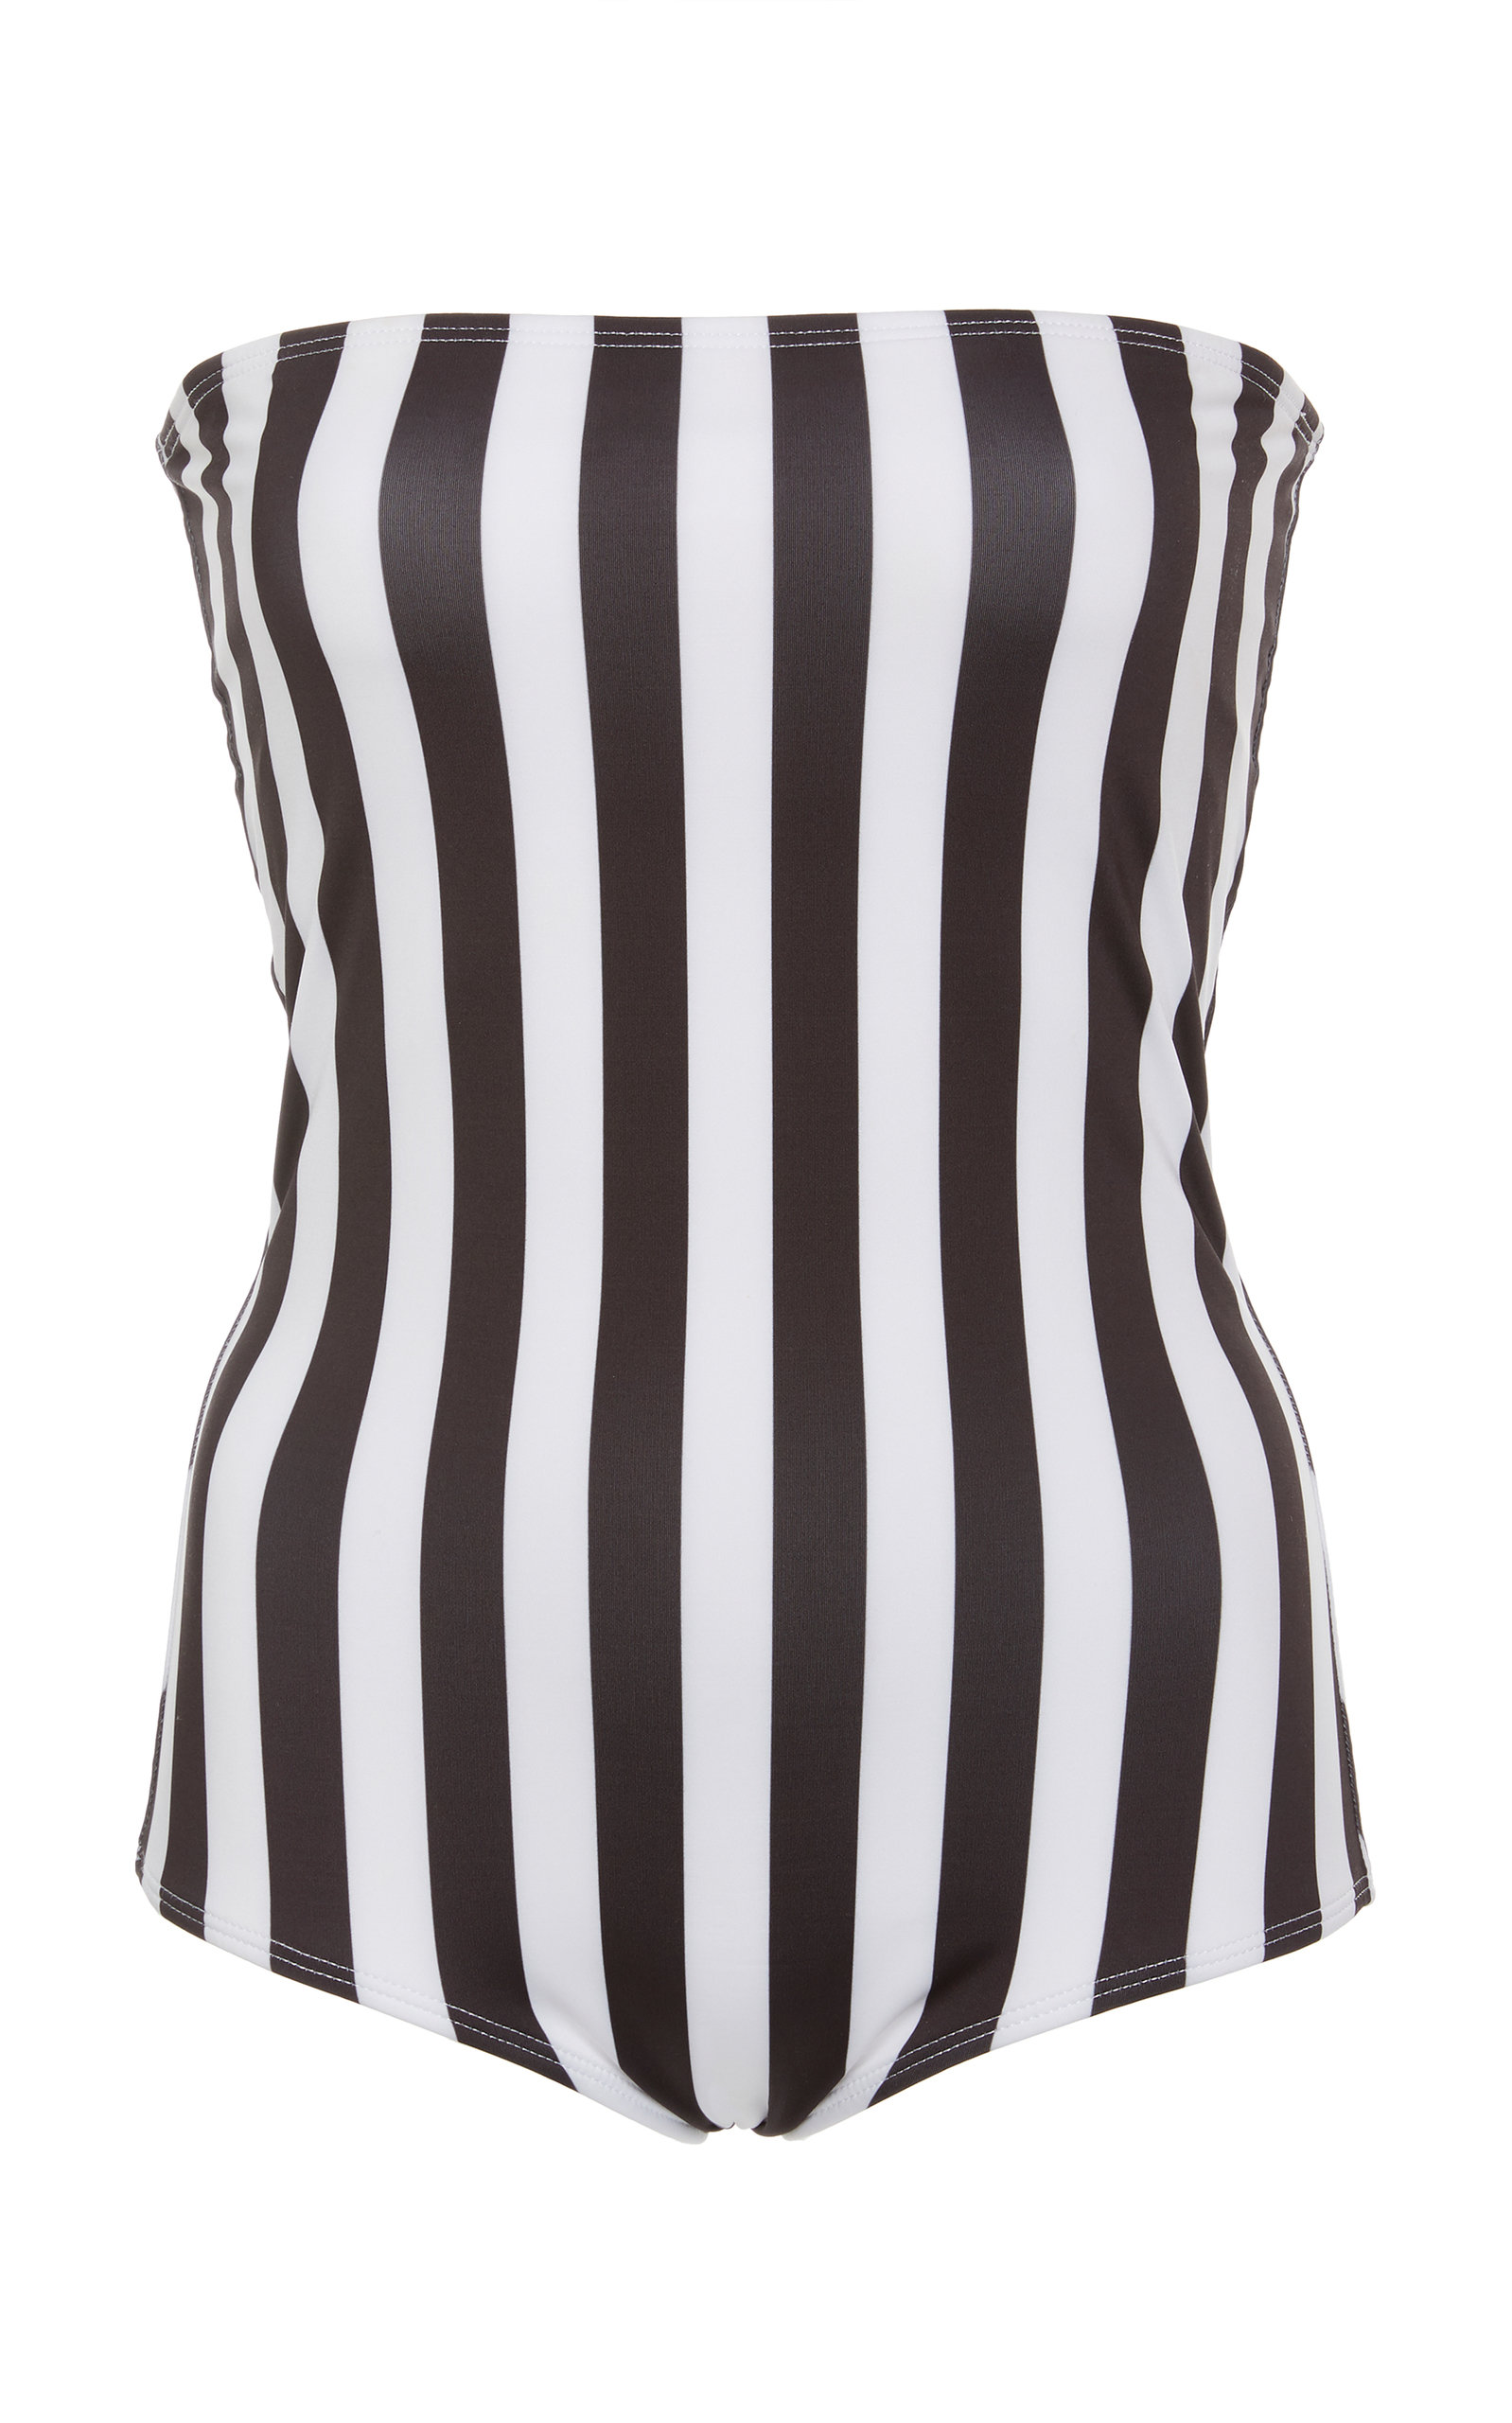 VERDELIMON Tijuana Strapless One Piece Swimsuit in Black/White